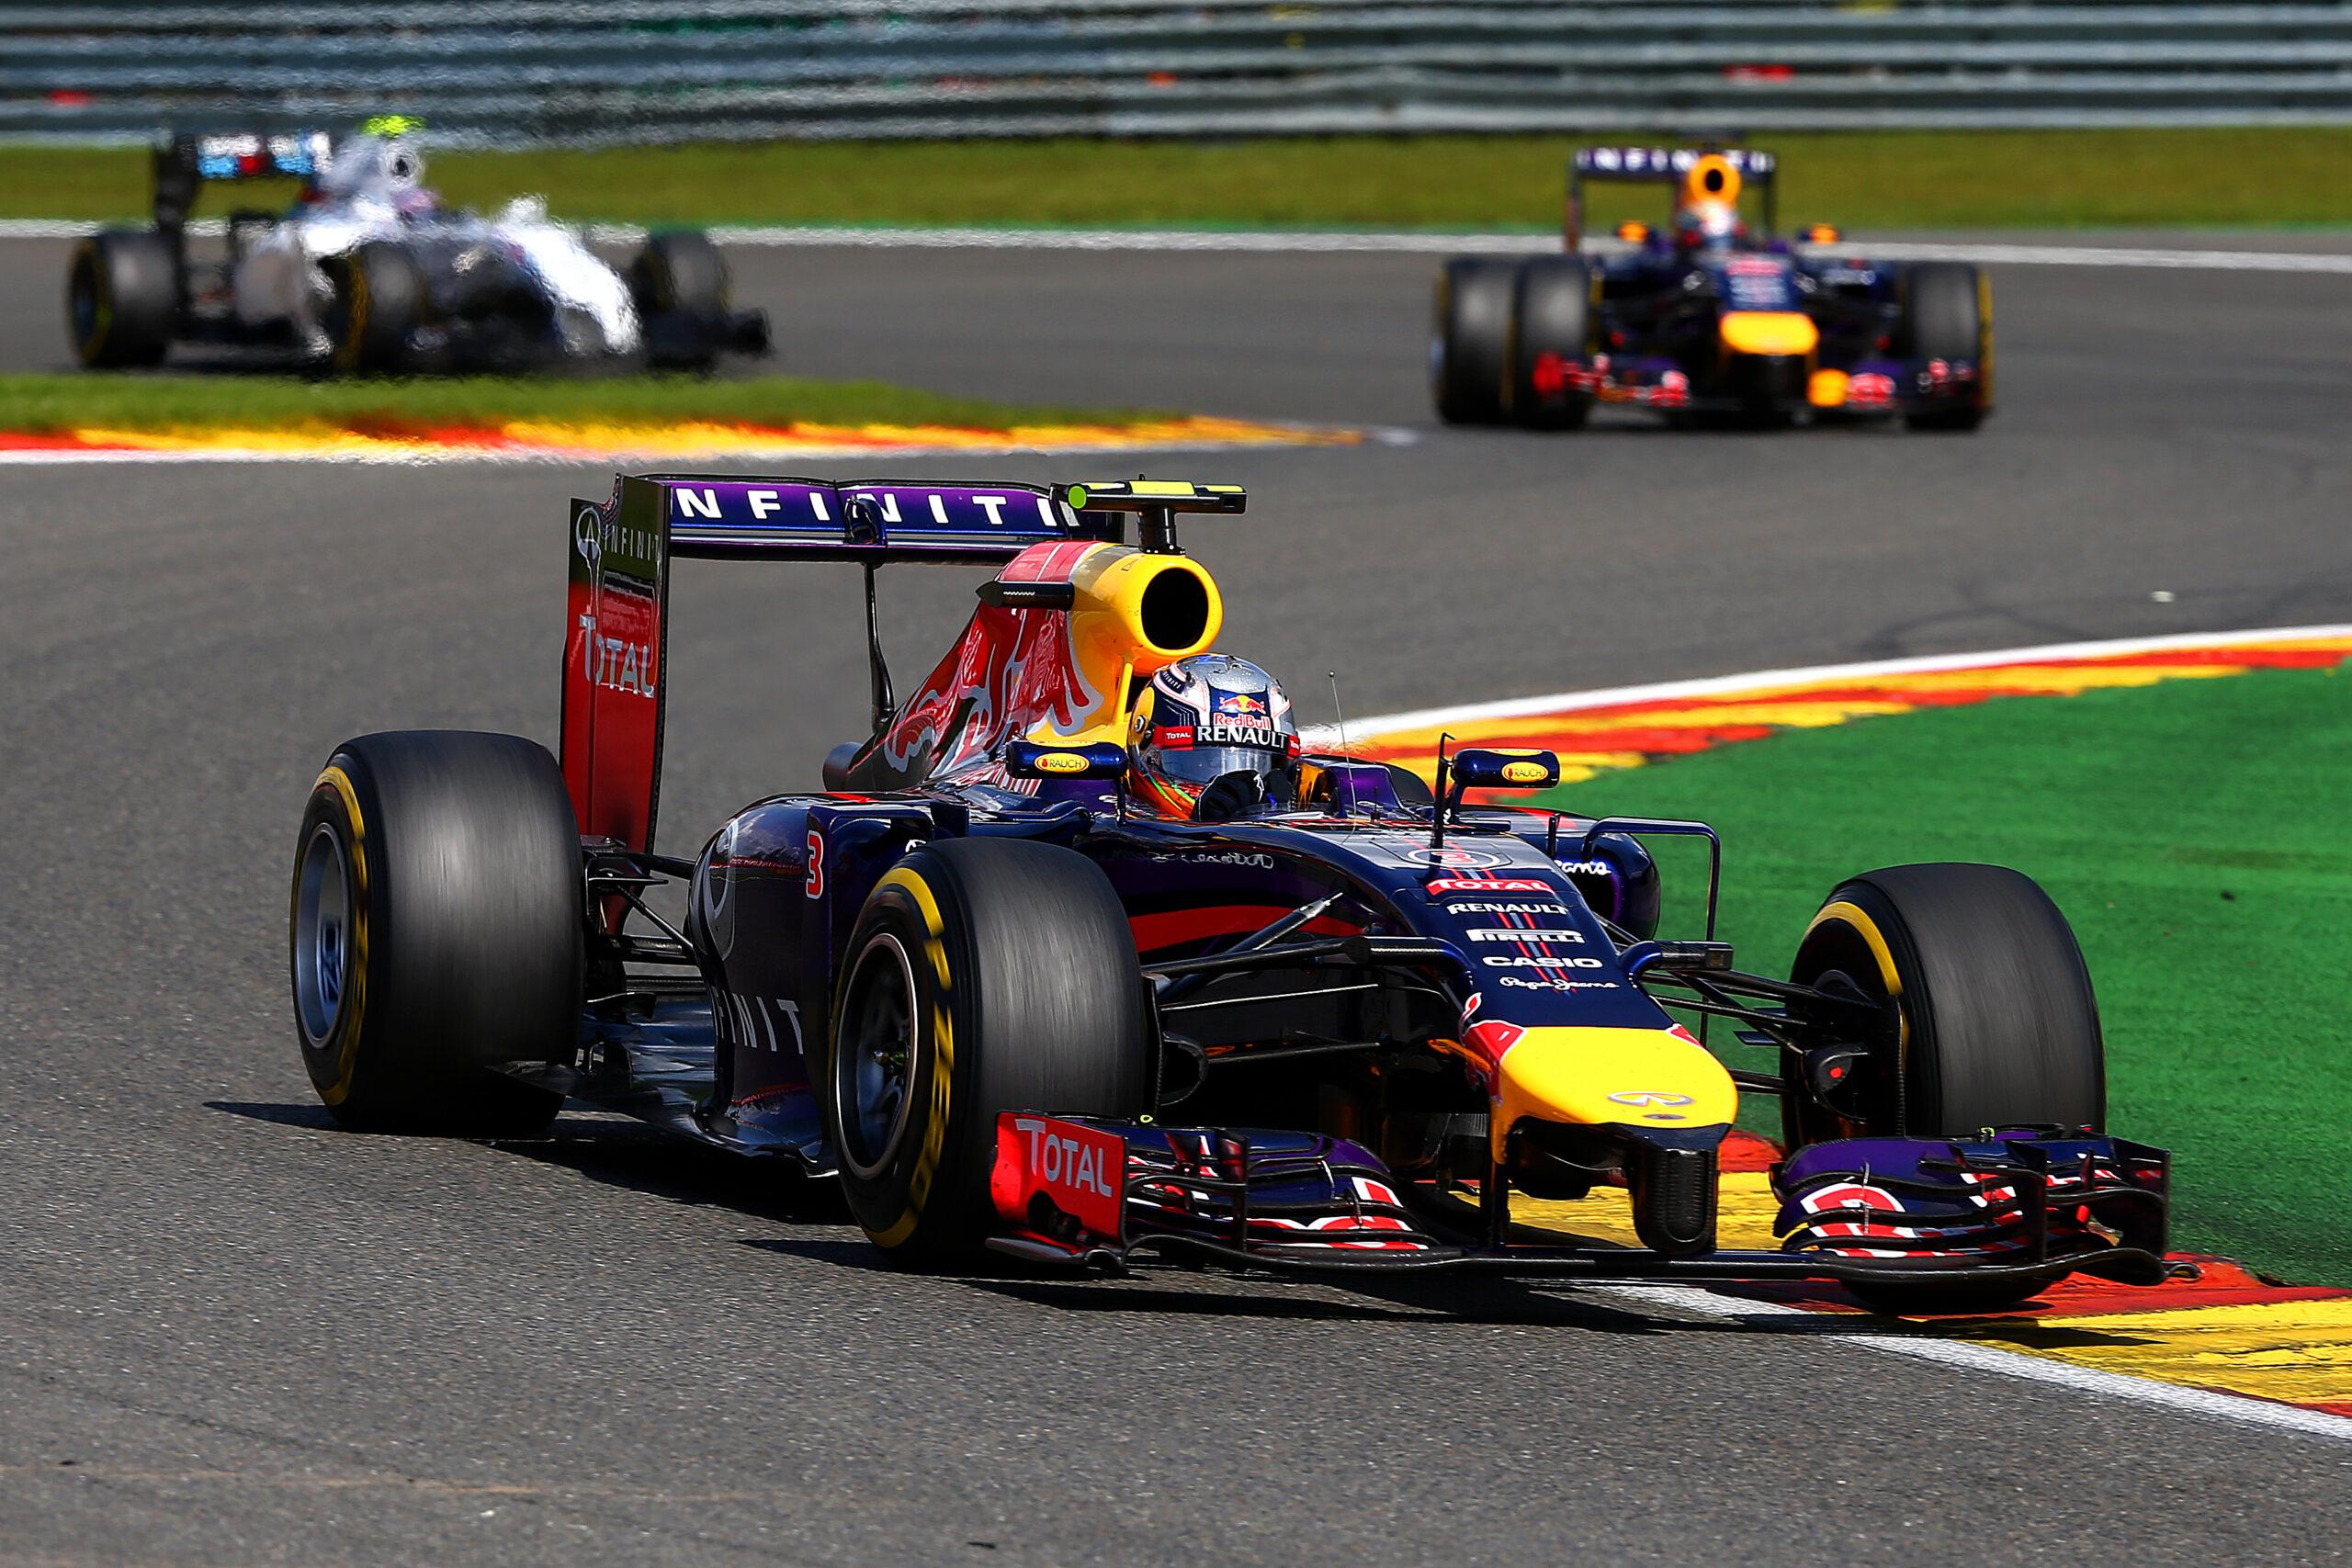 Formuła 1; GP Belgii 2014